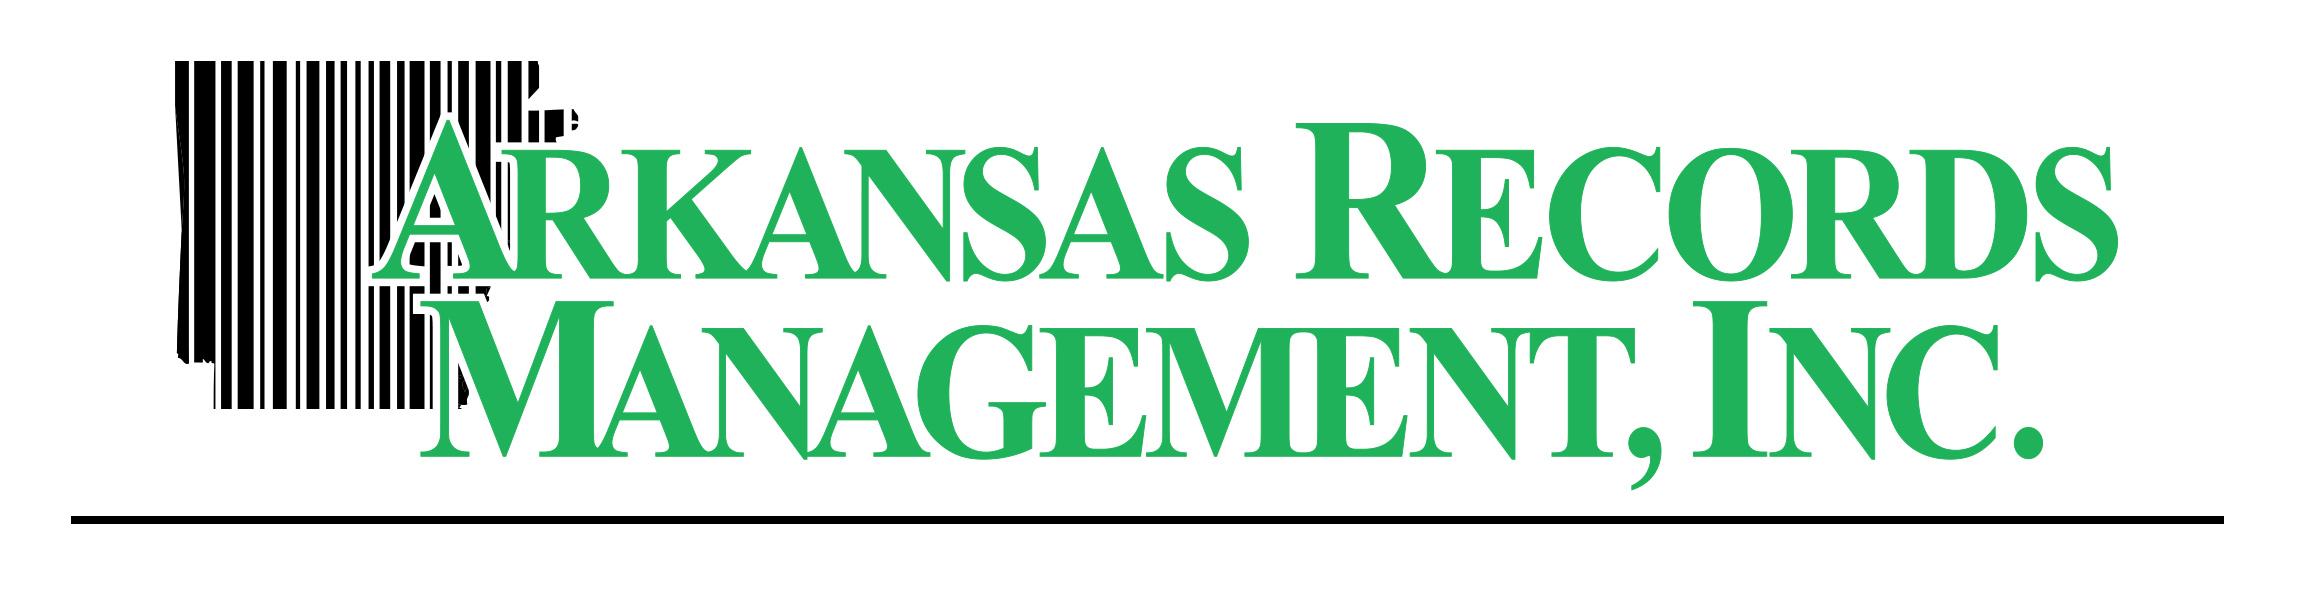 Arkansas Records Management